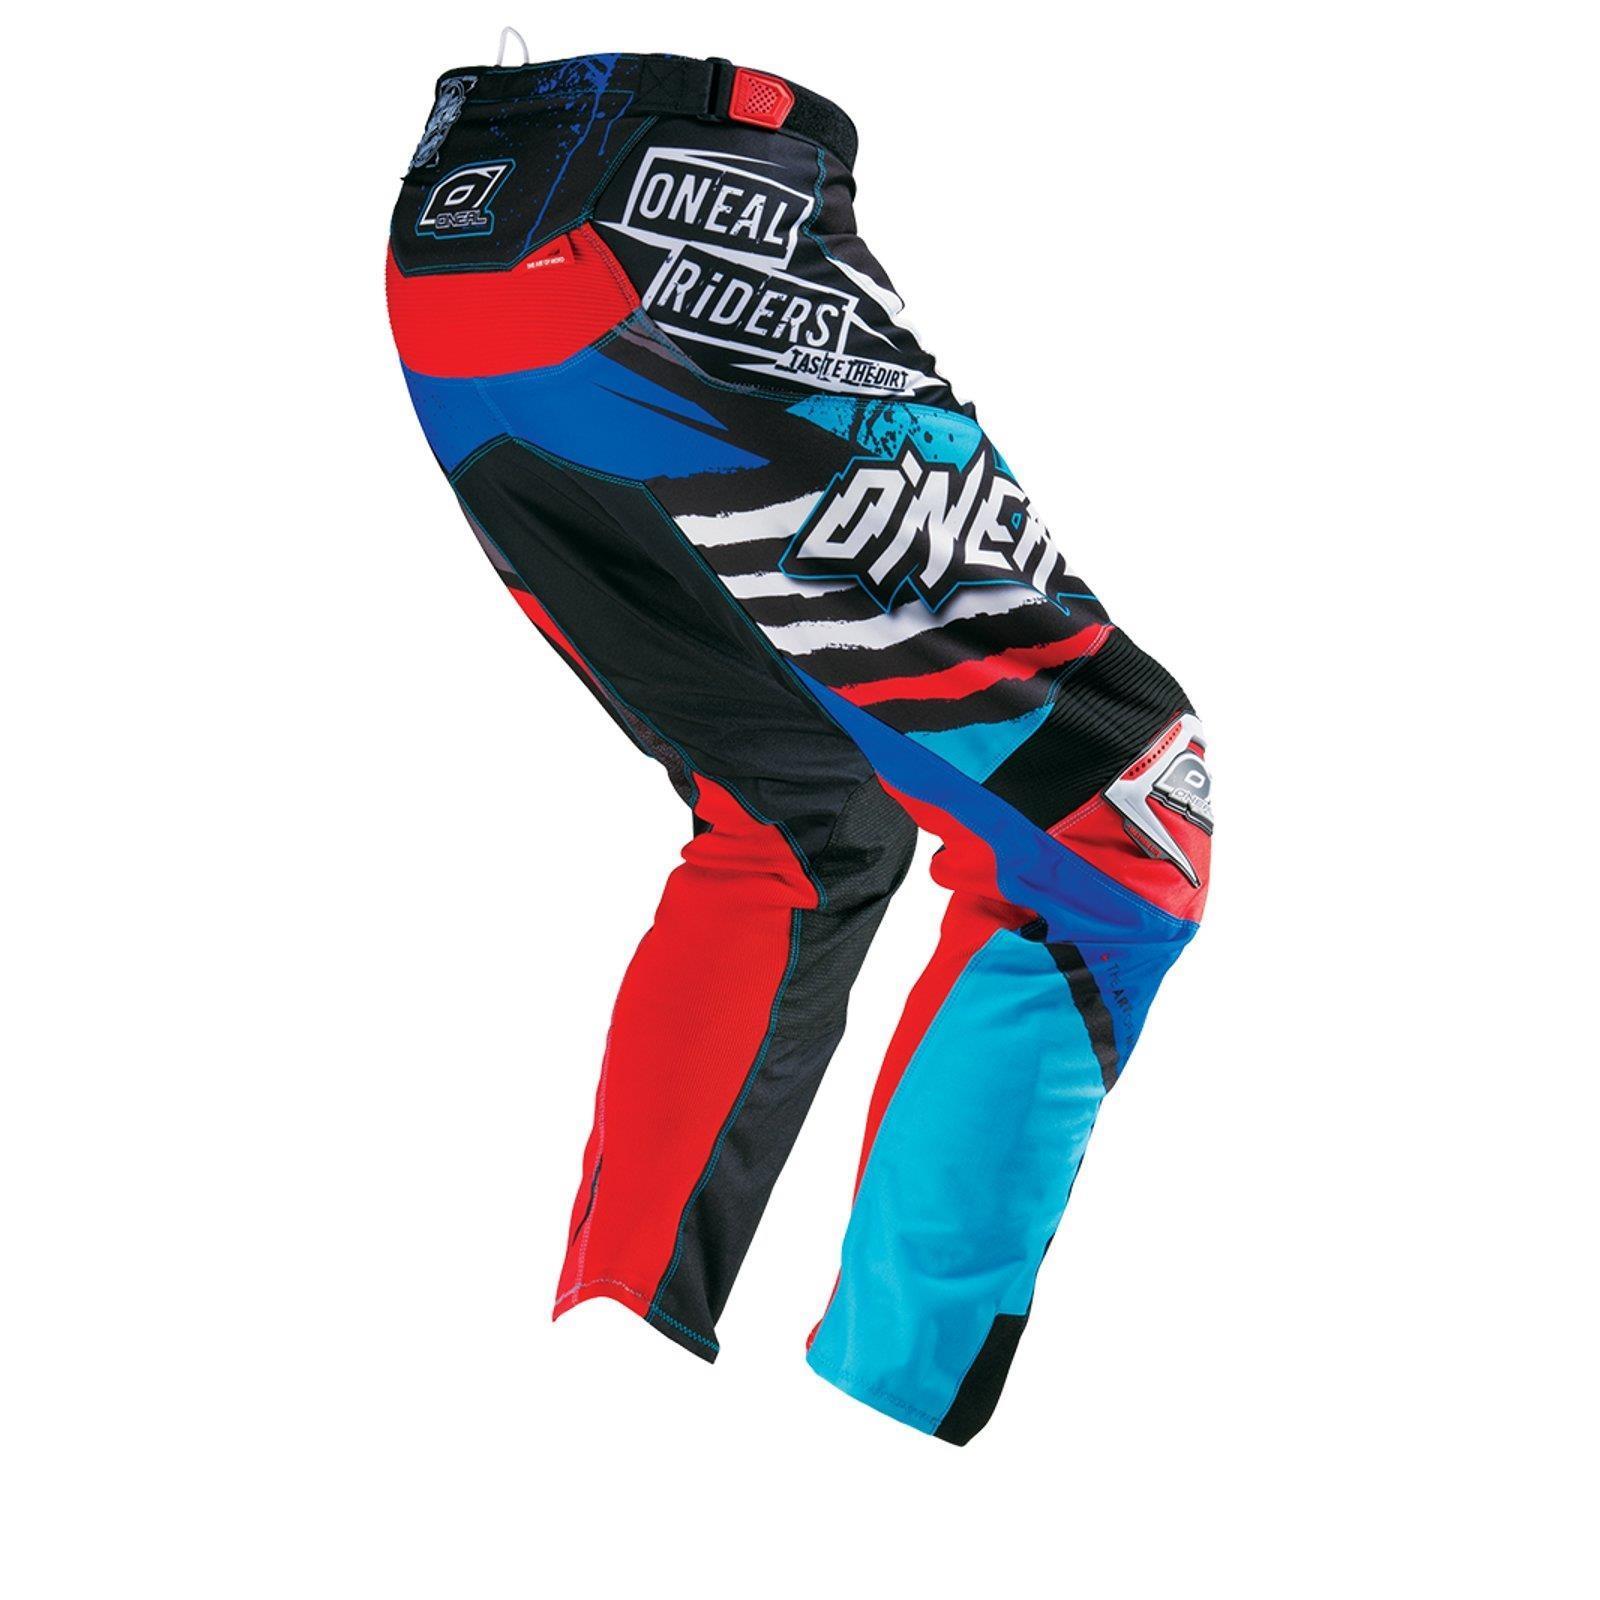 O-039-neal-elemento-Mayhem-Hardwear-Pants-pantalones-MX-Moto-Cross-Enduro-todoterreno-cuero miniatura 24